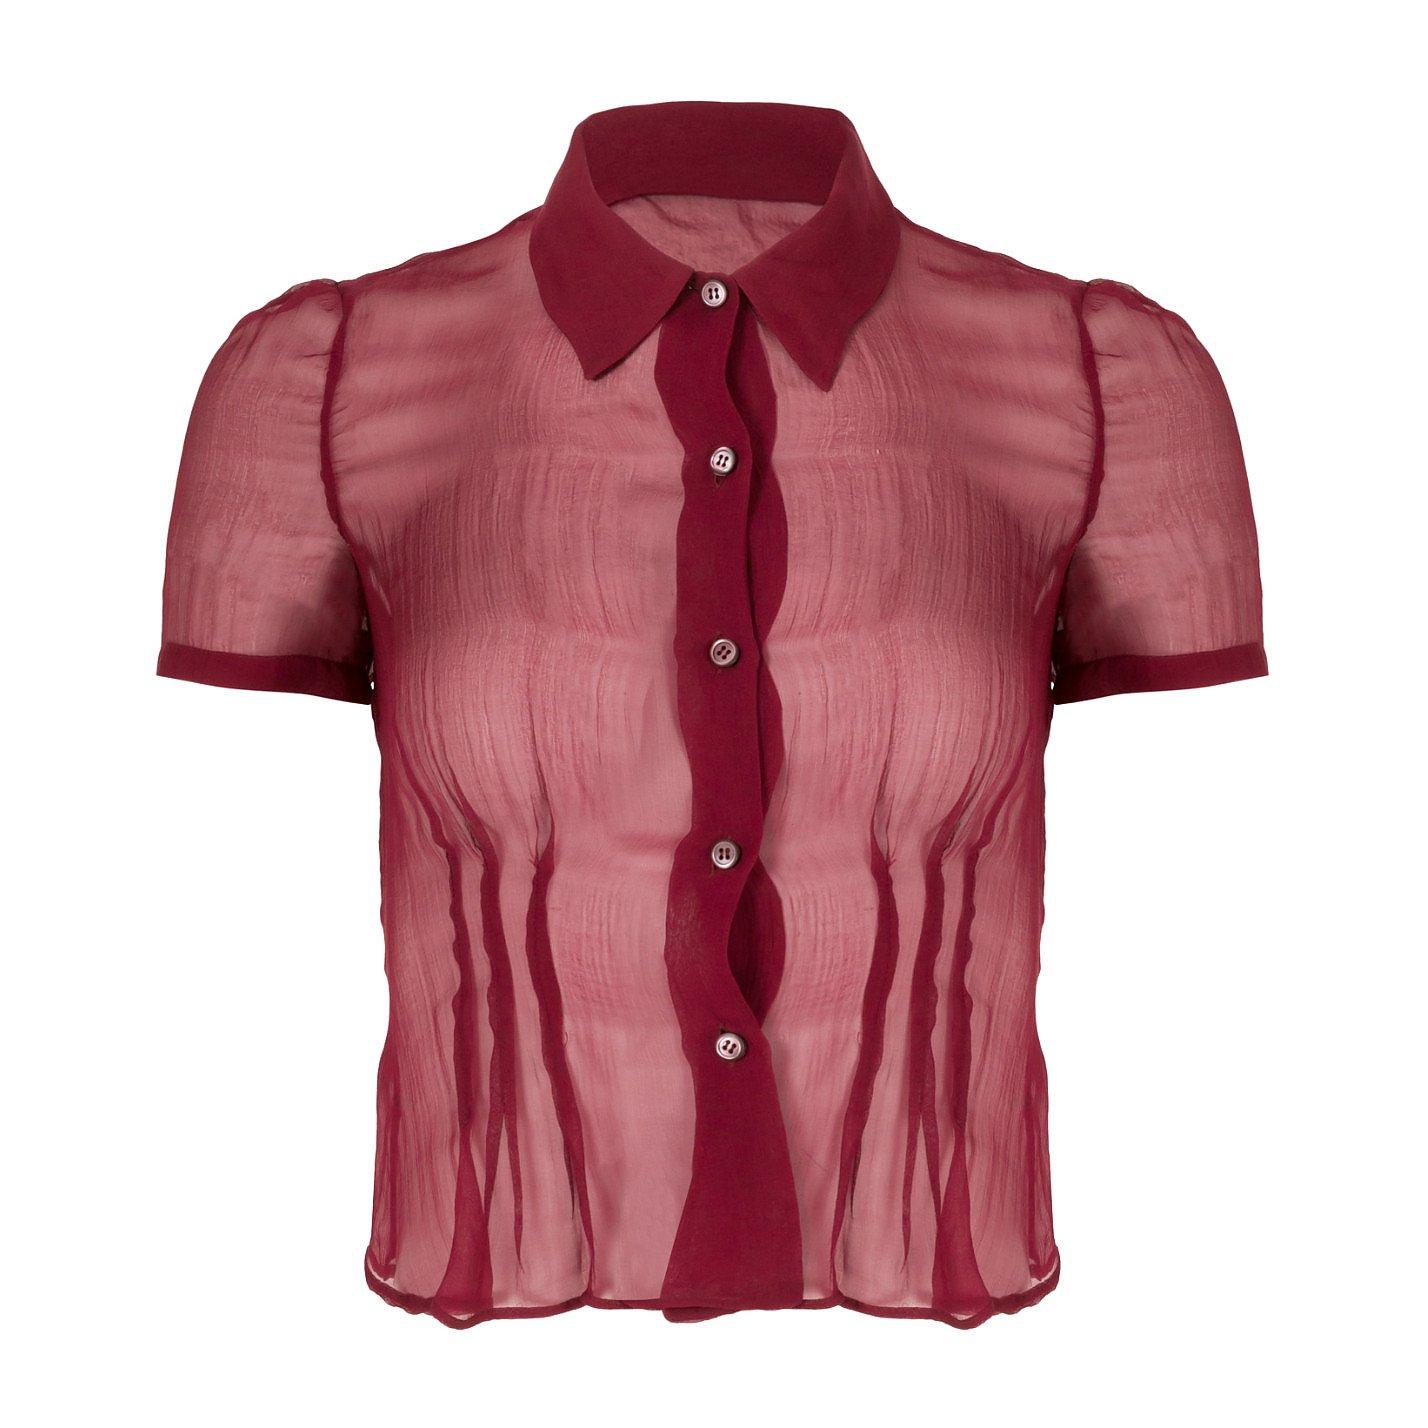 PRADA Sheer Silk Shirt